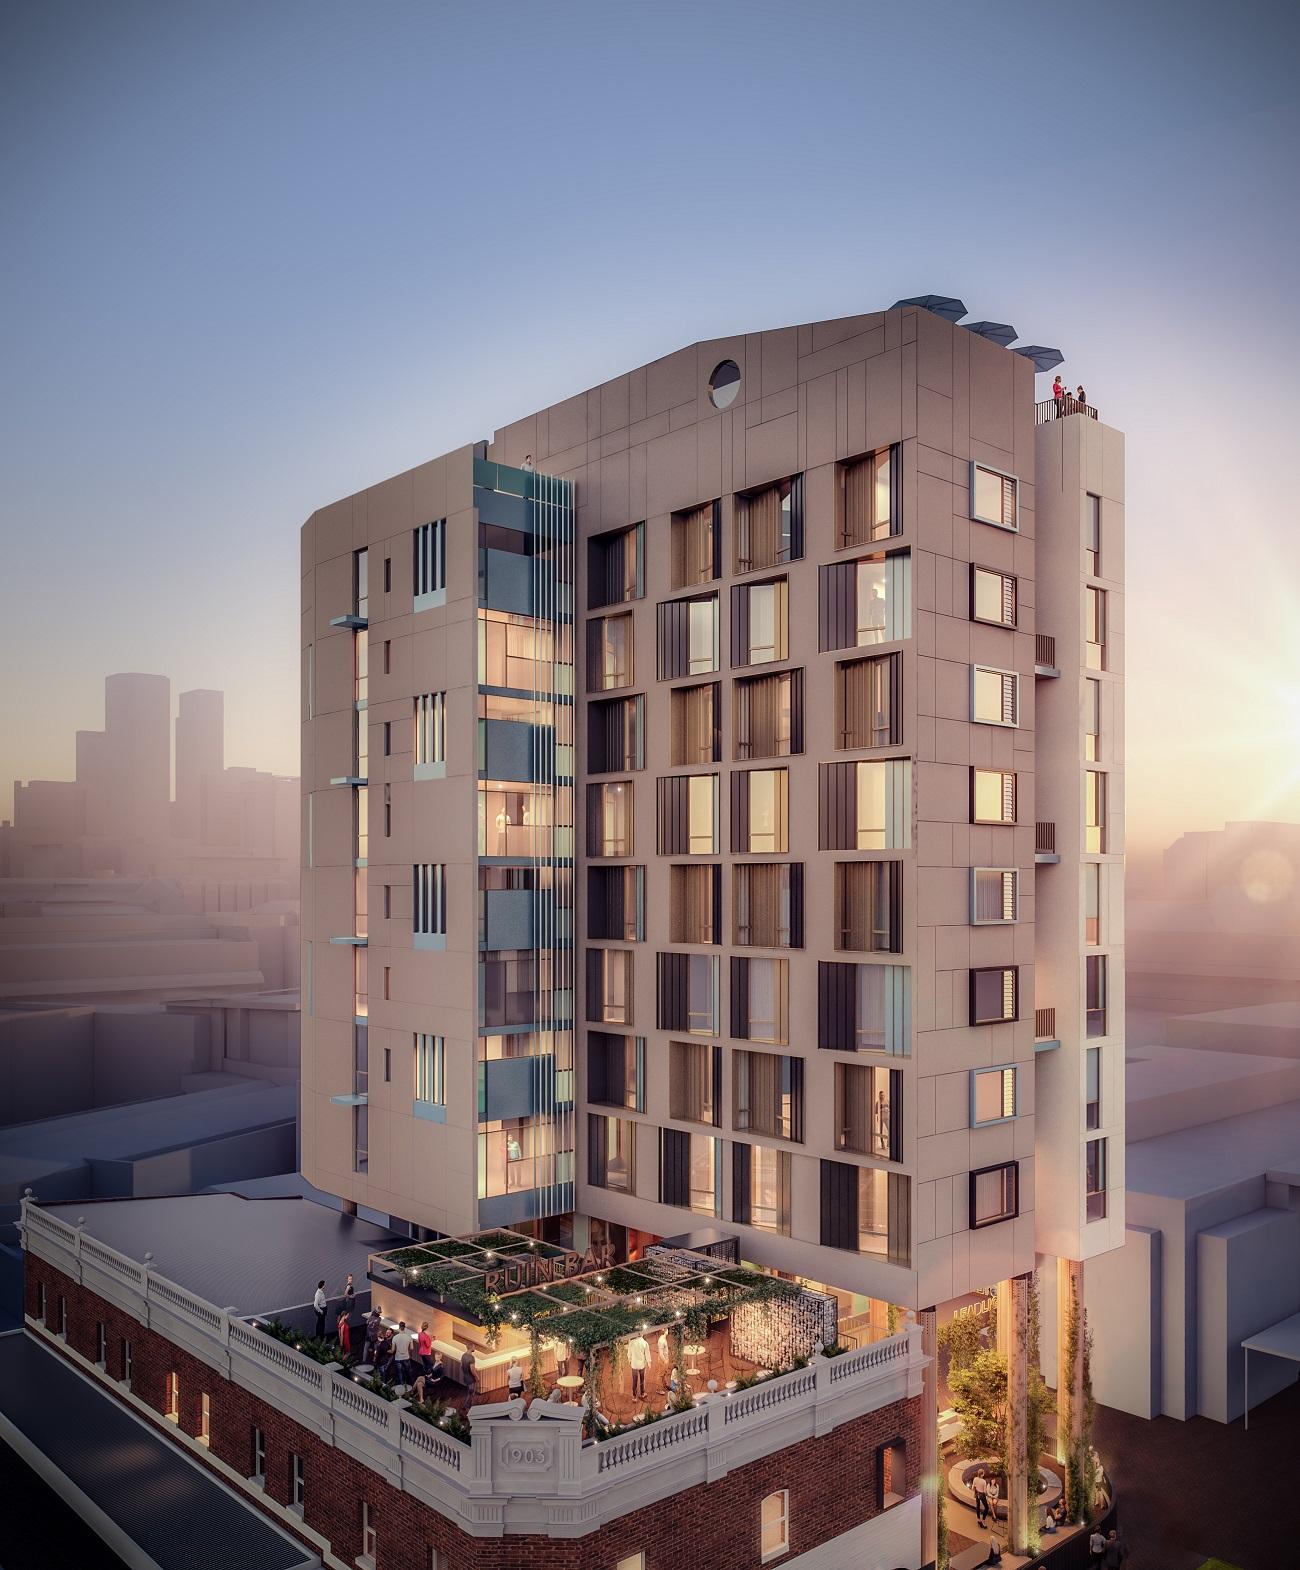 Leadlight hotel - Hera Engineering